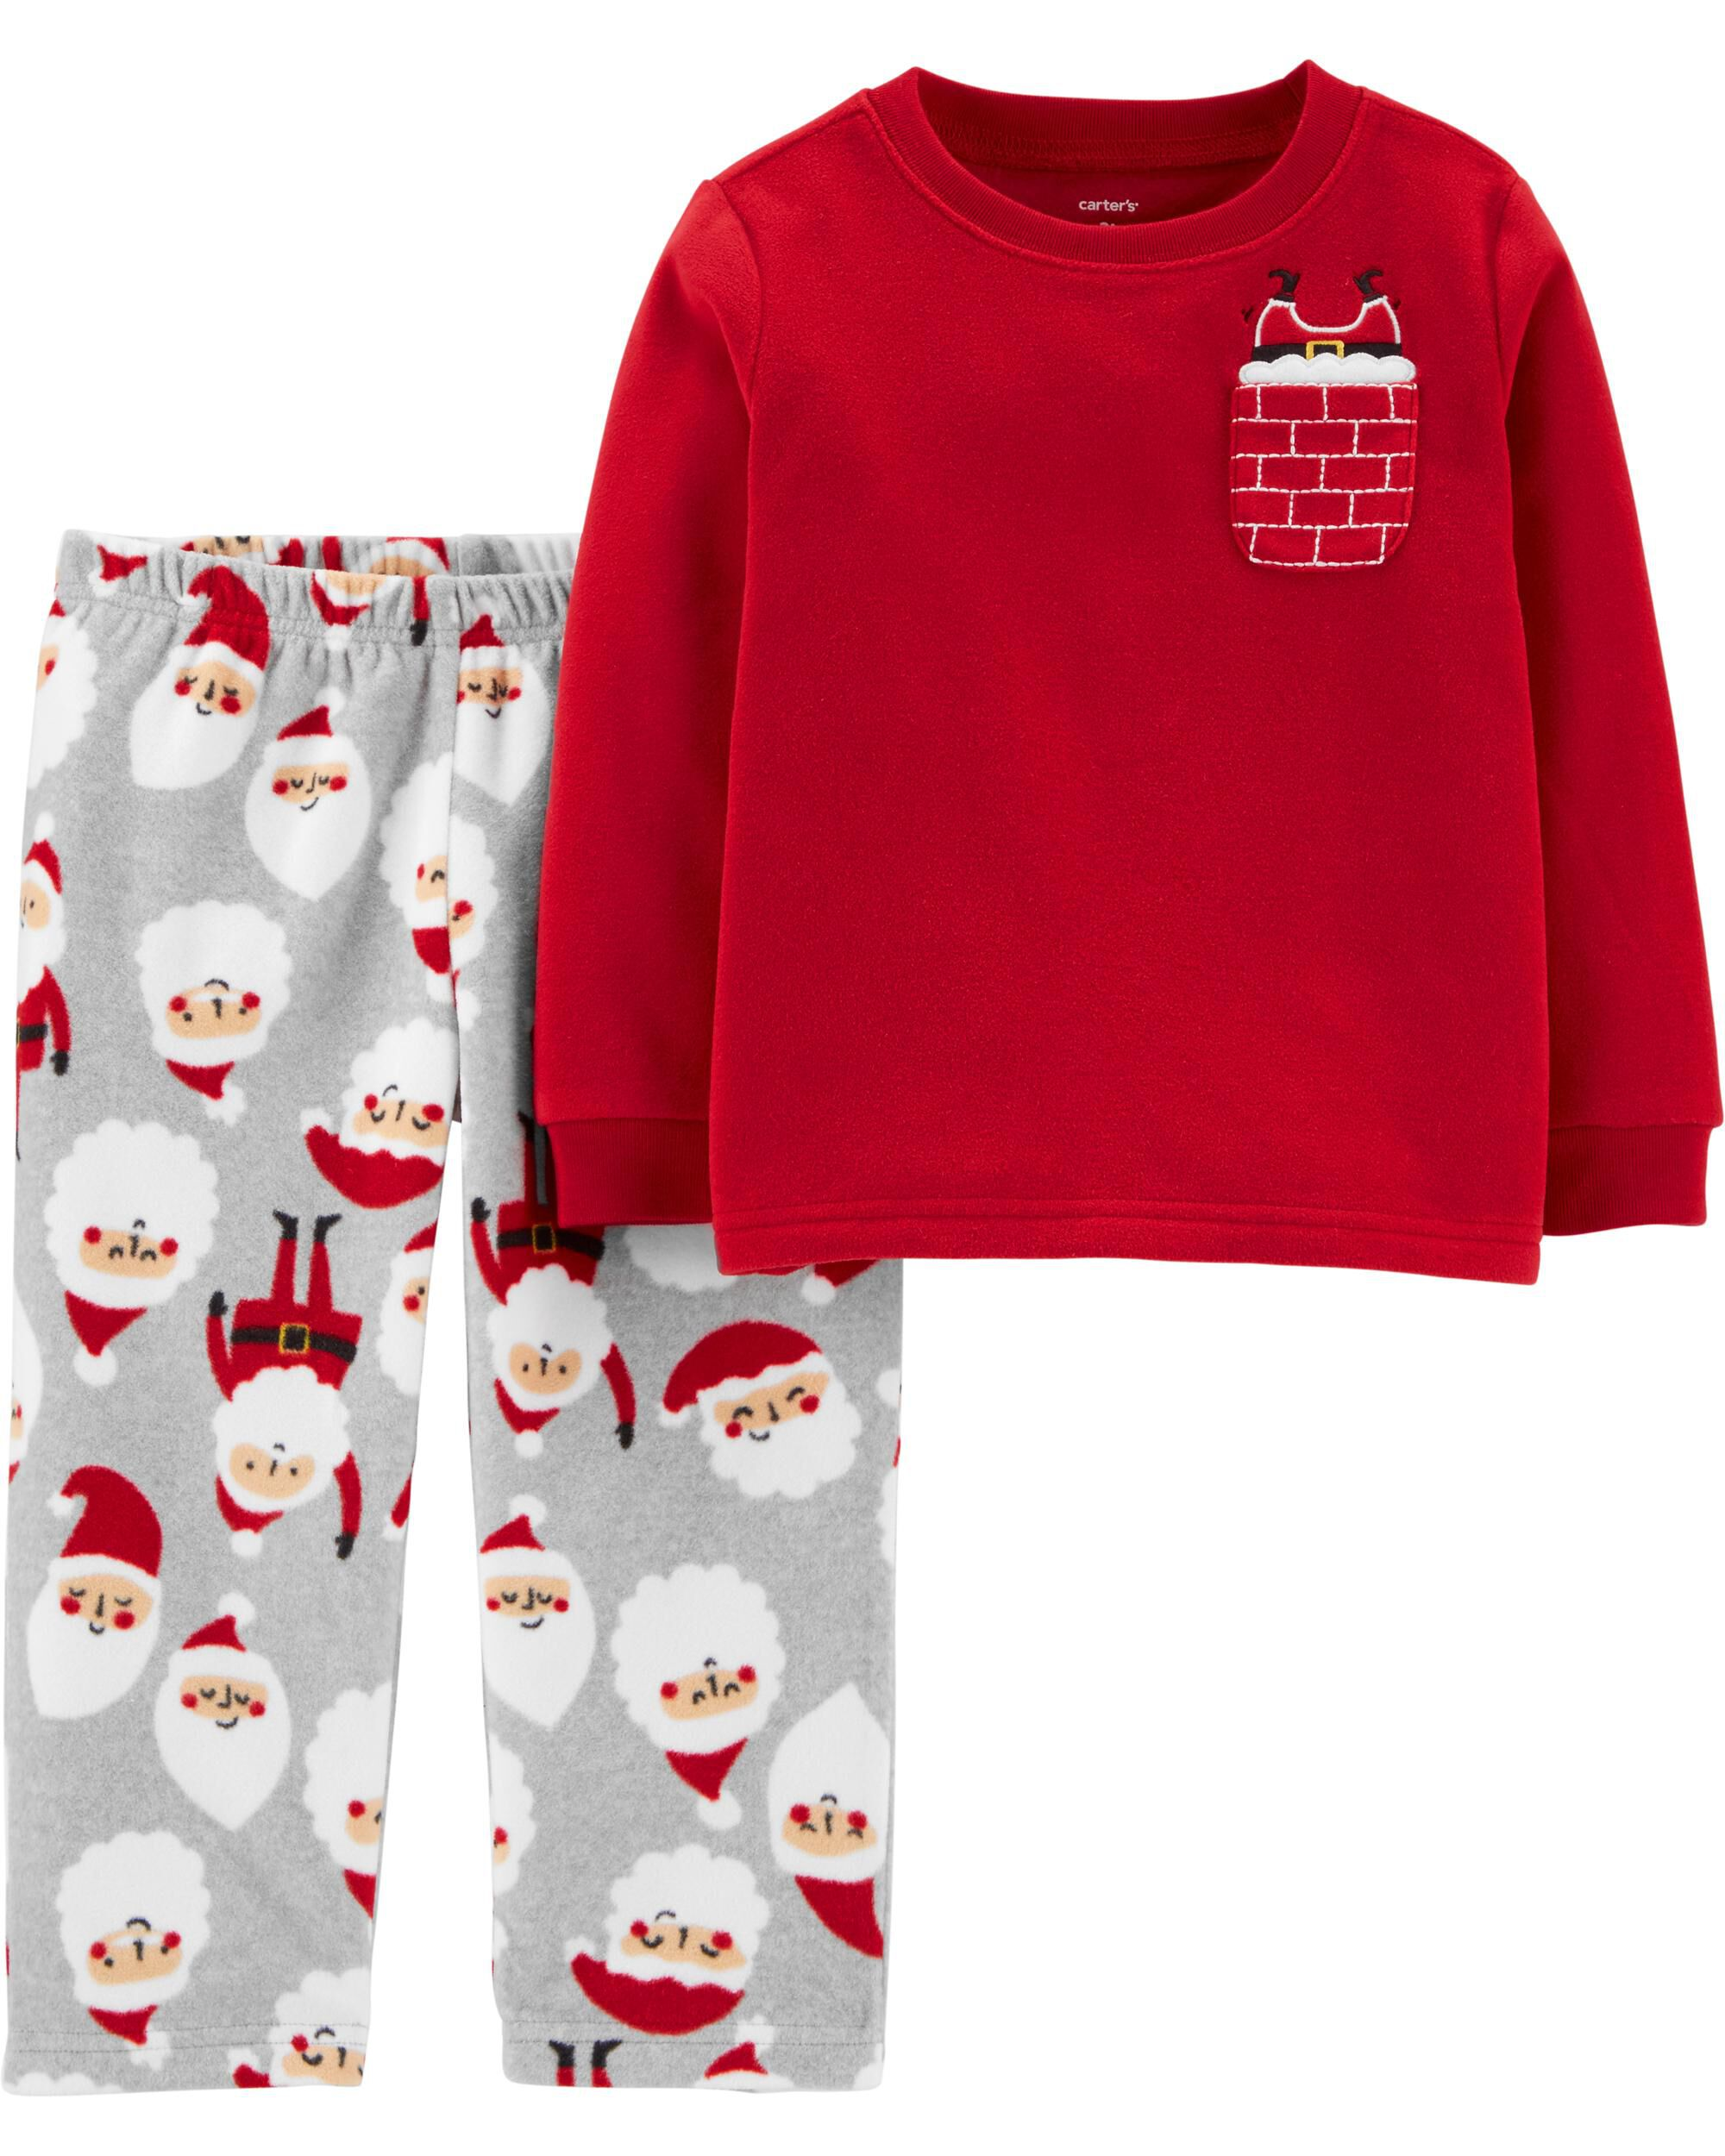 New CARTER/'S Girls Santa Pajamas 6m 9m 12m 18m Christmas Holiday Red